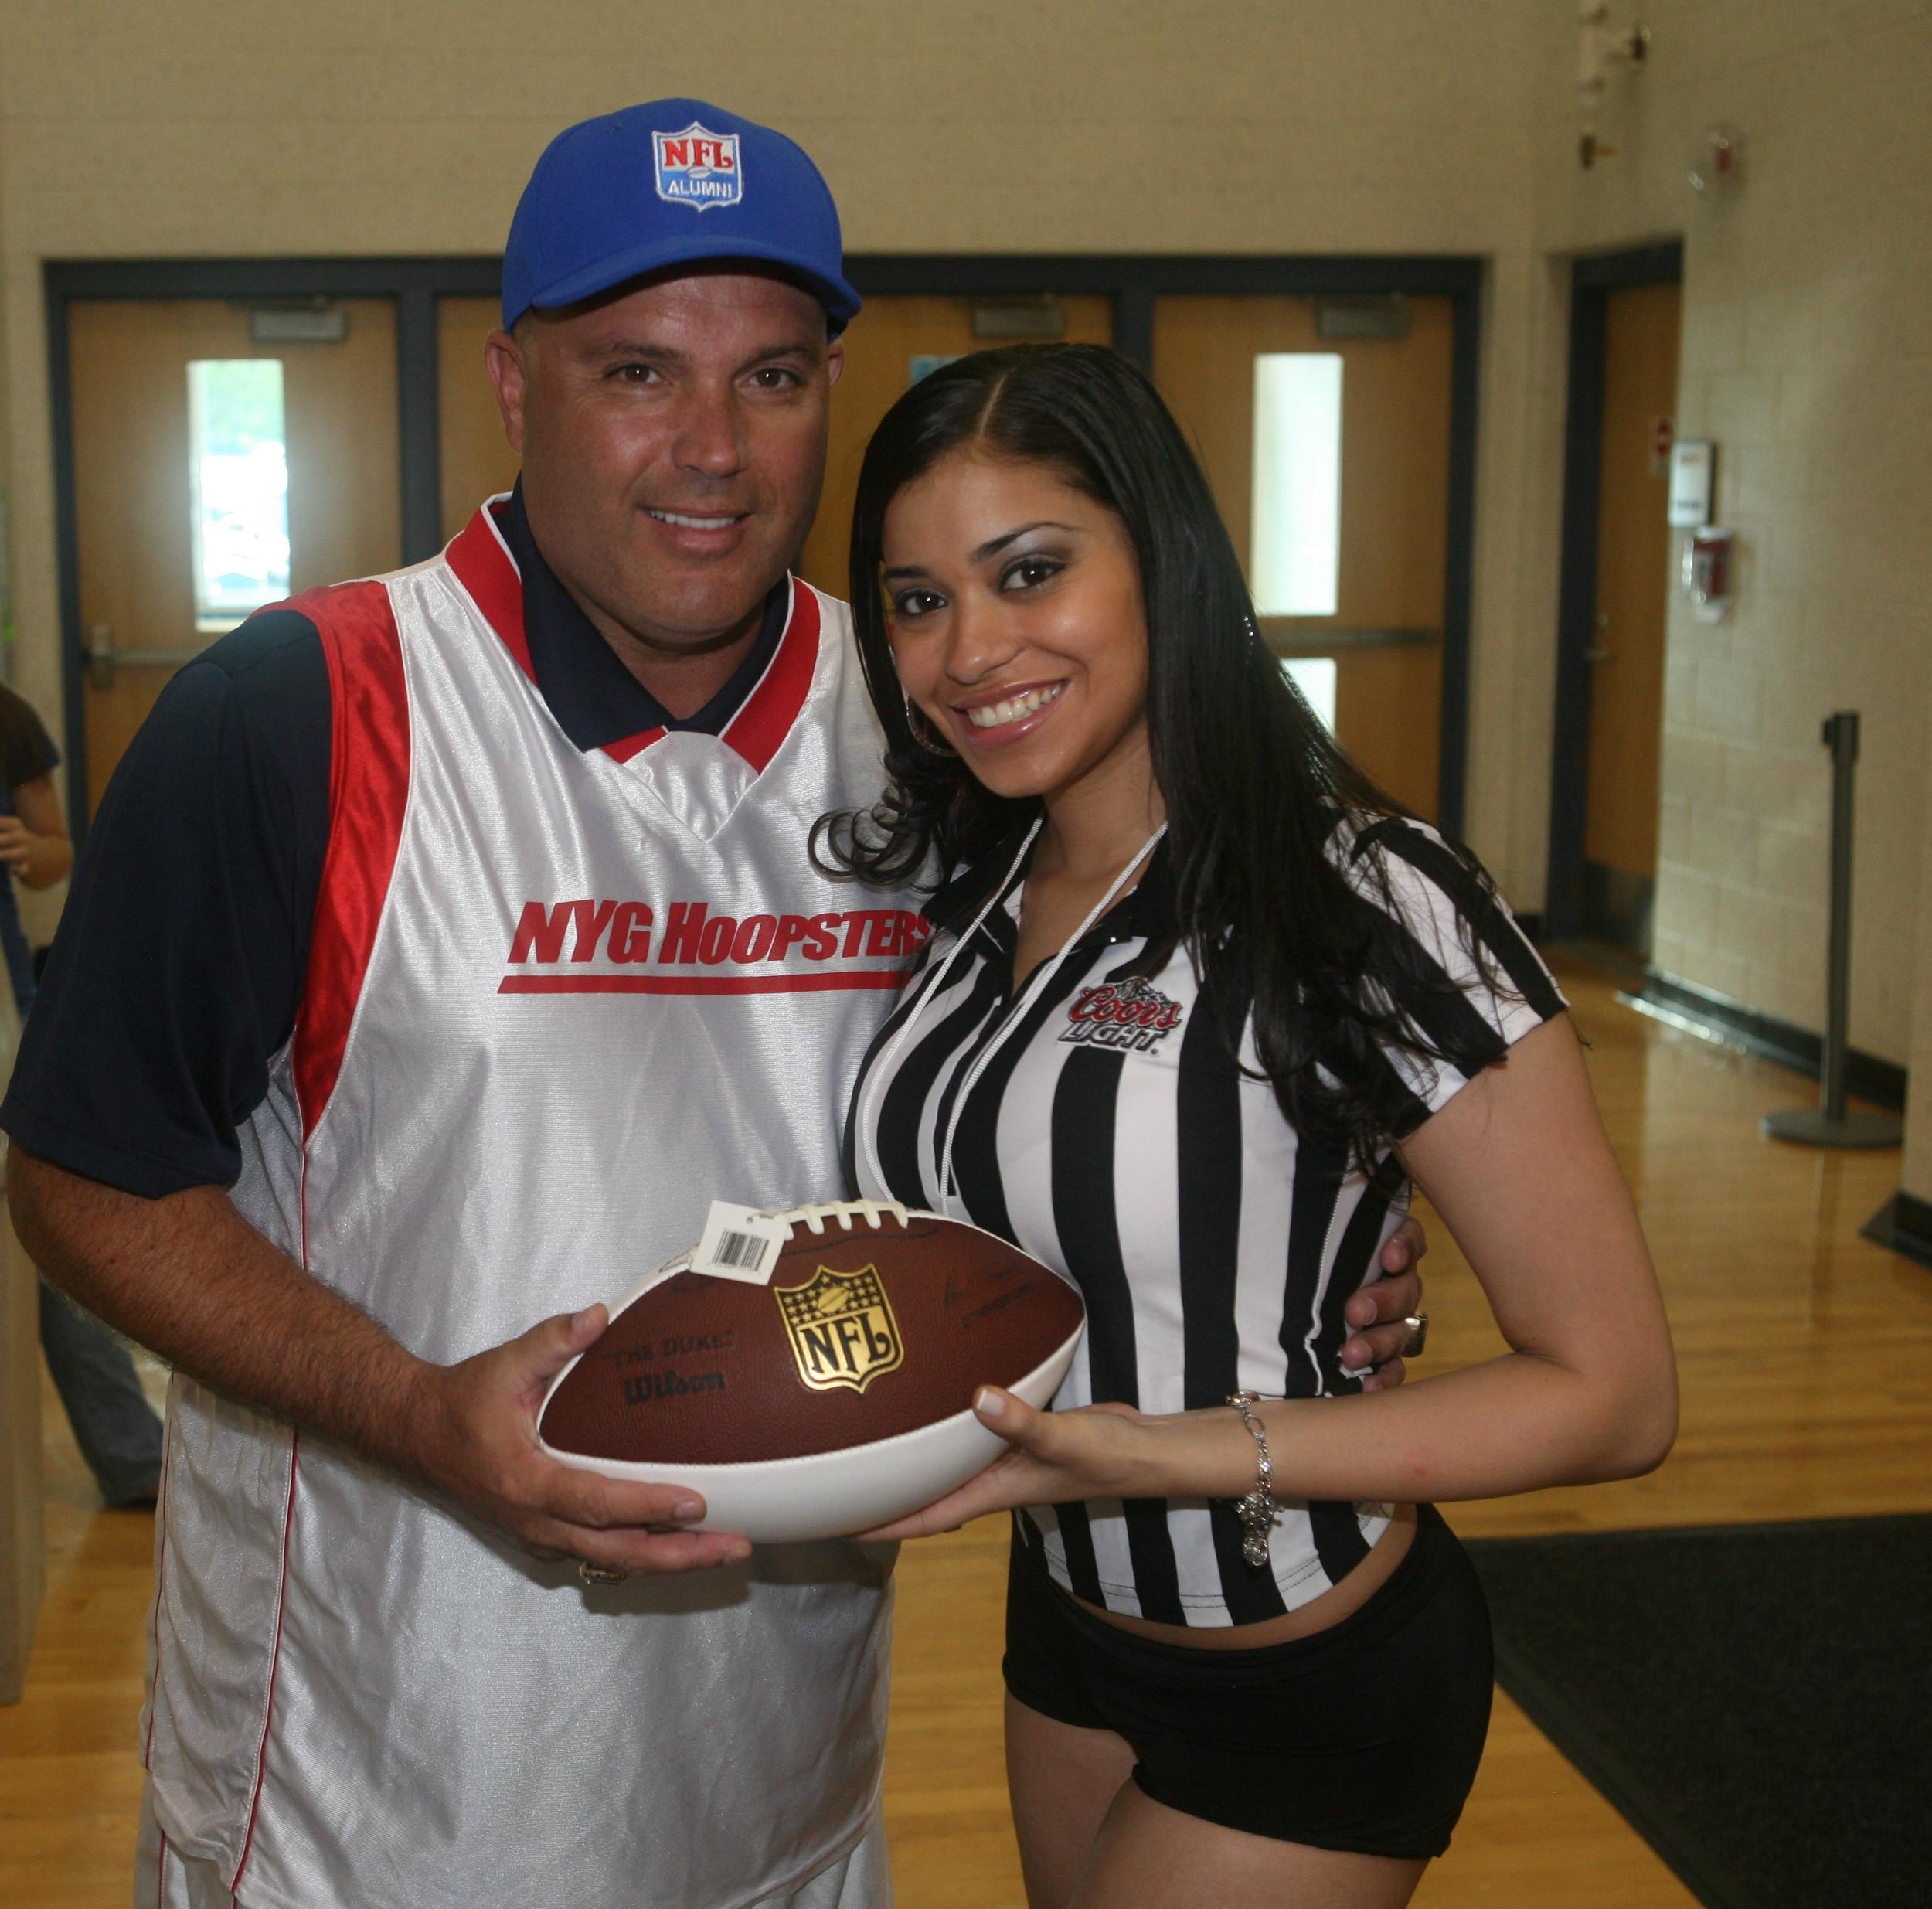 NFL Giants Player, Sean Landeta